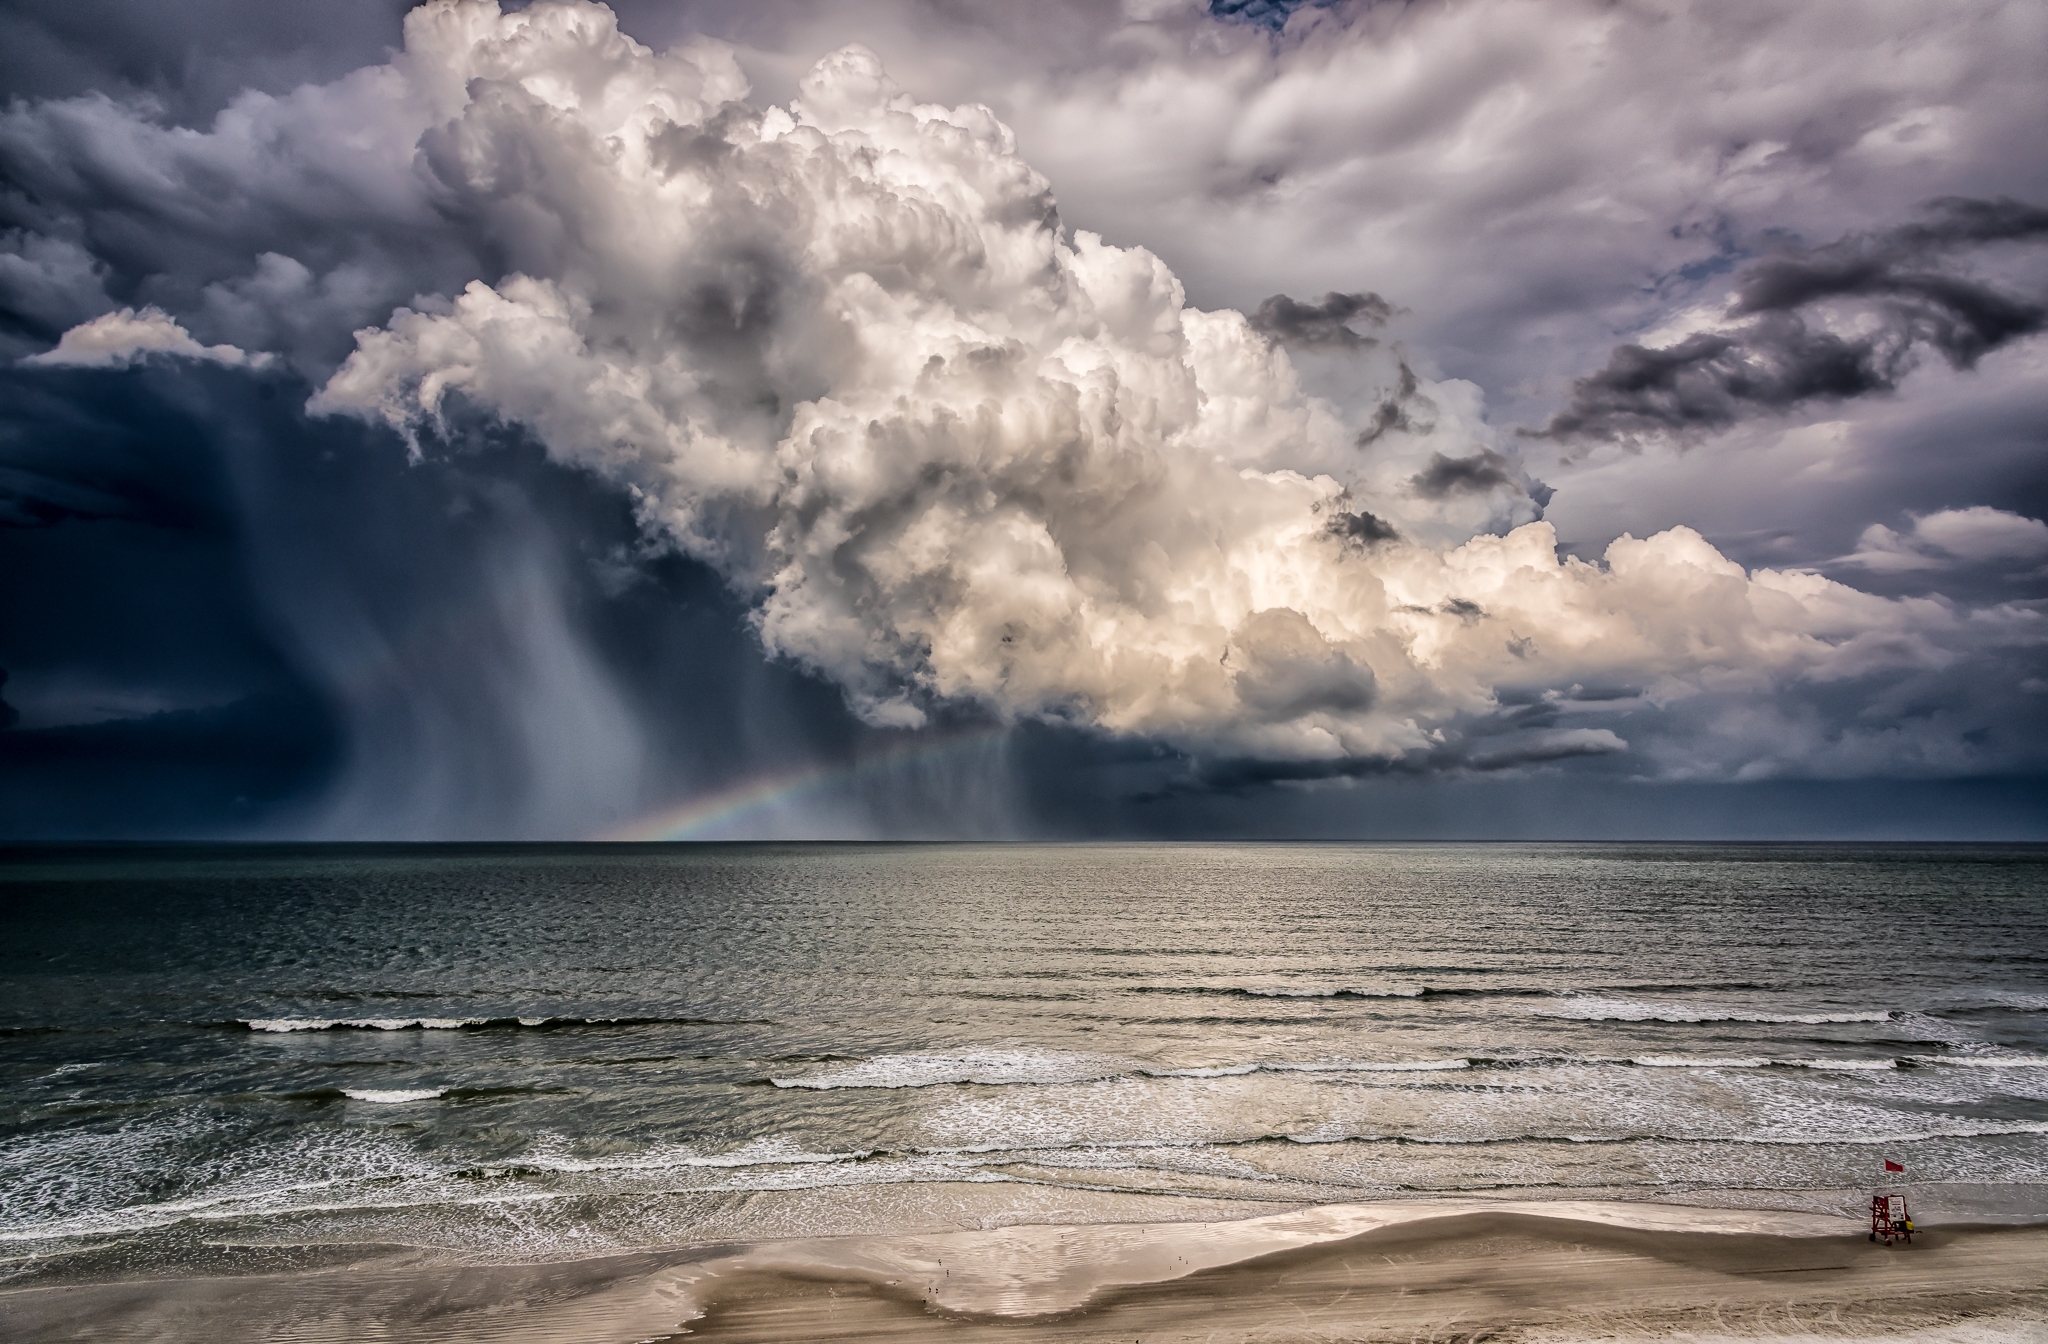 Storm at New Smyrna Beach